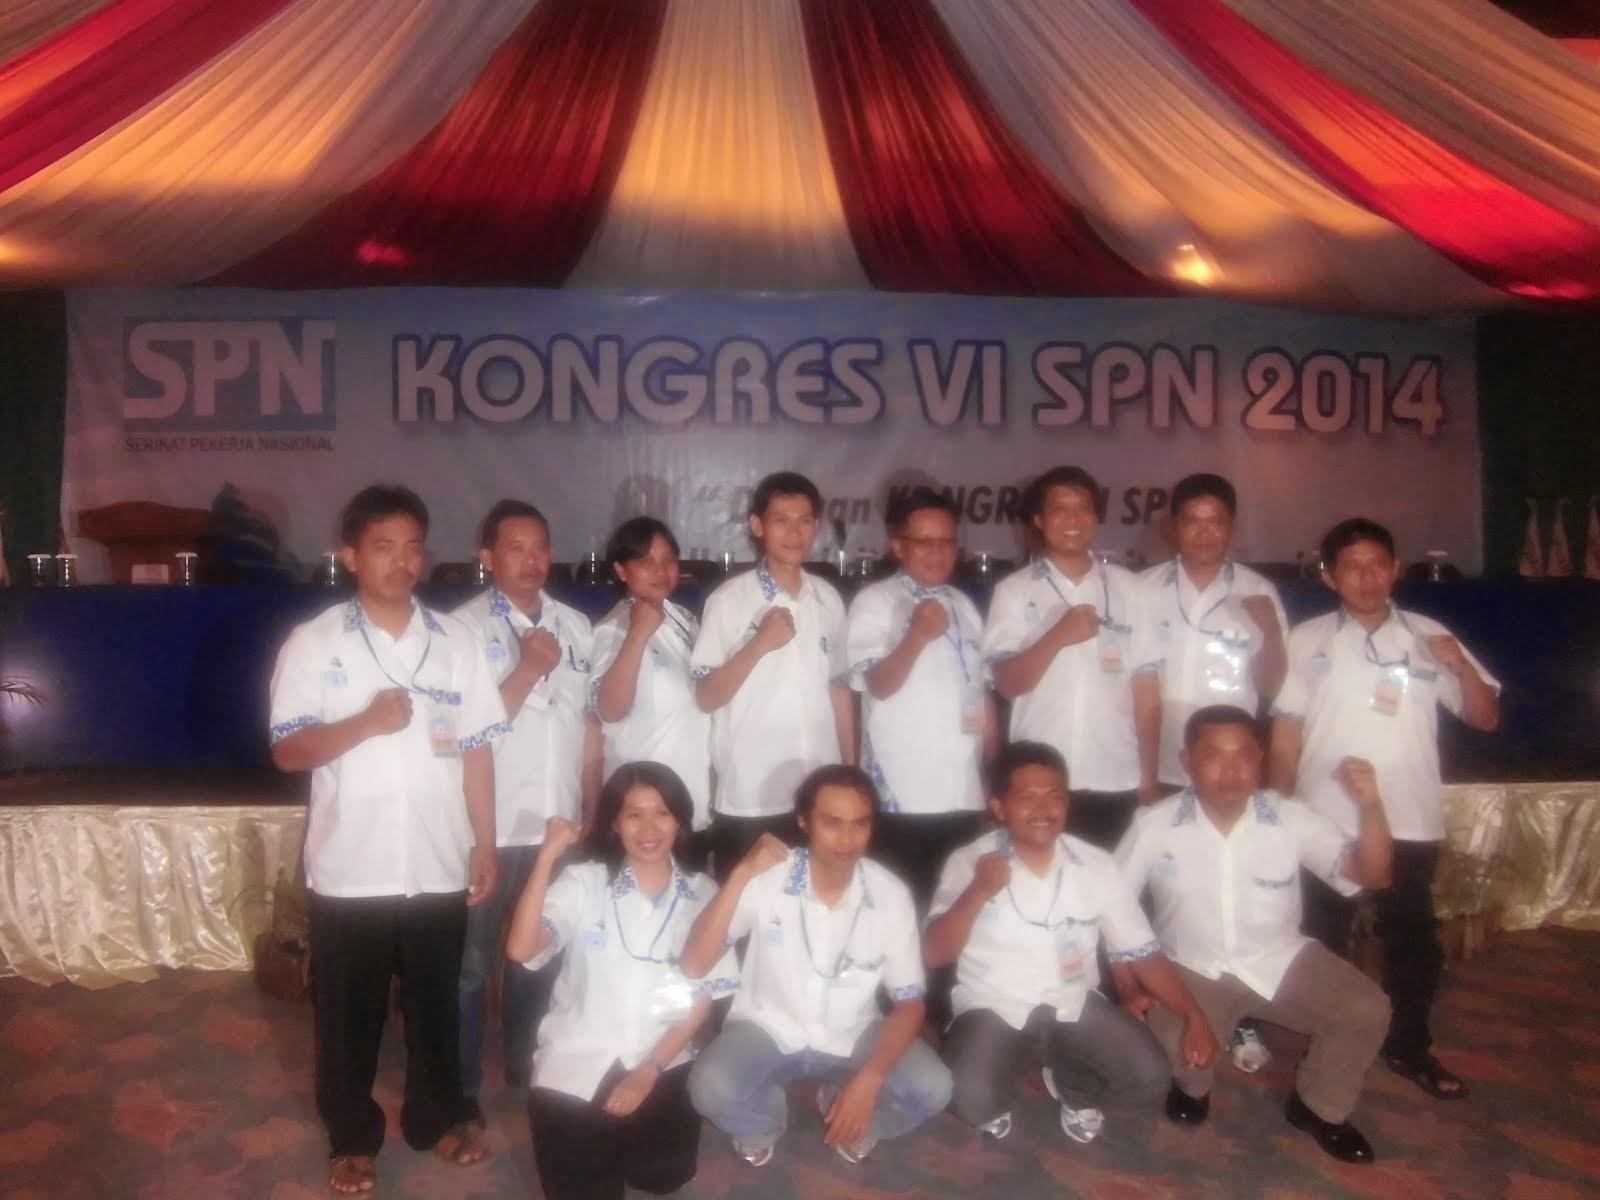 Kongres VI SPN